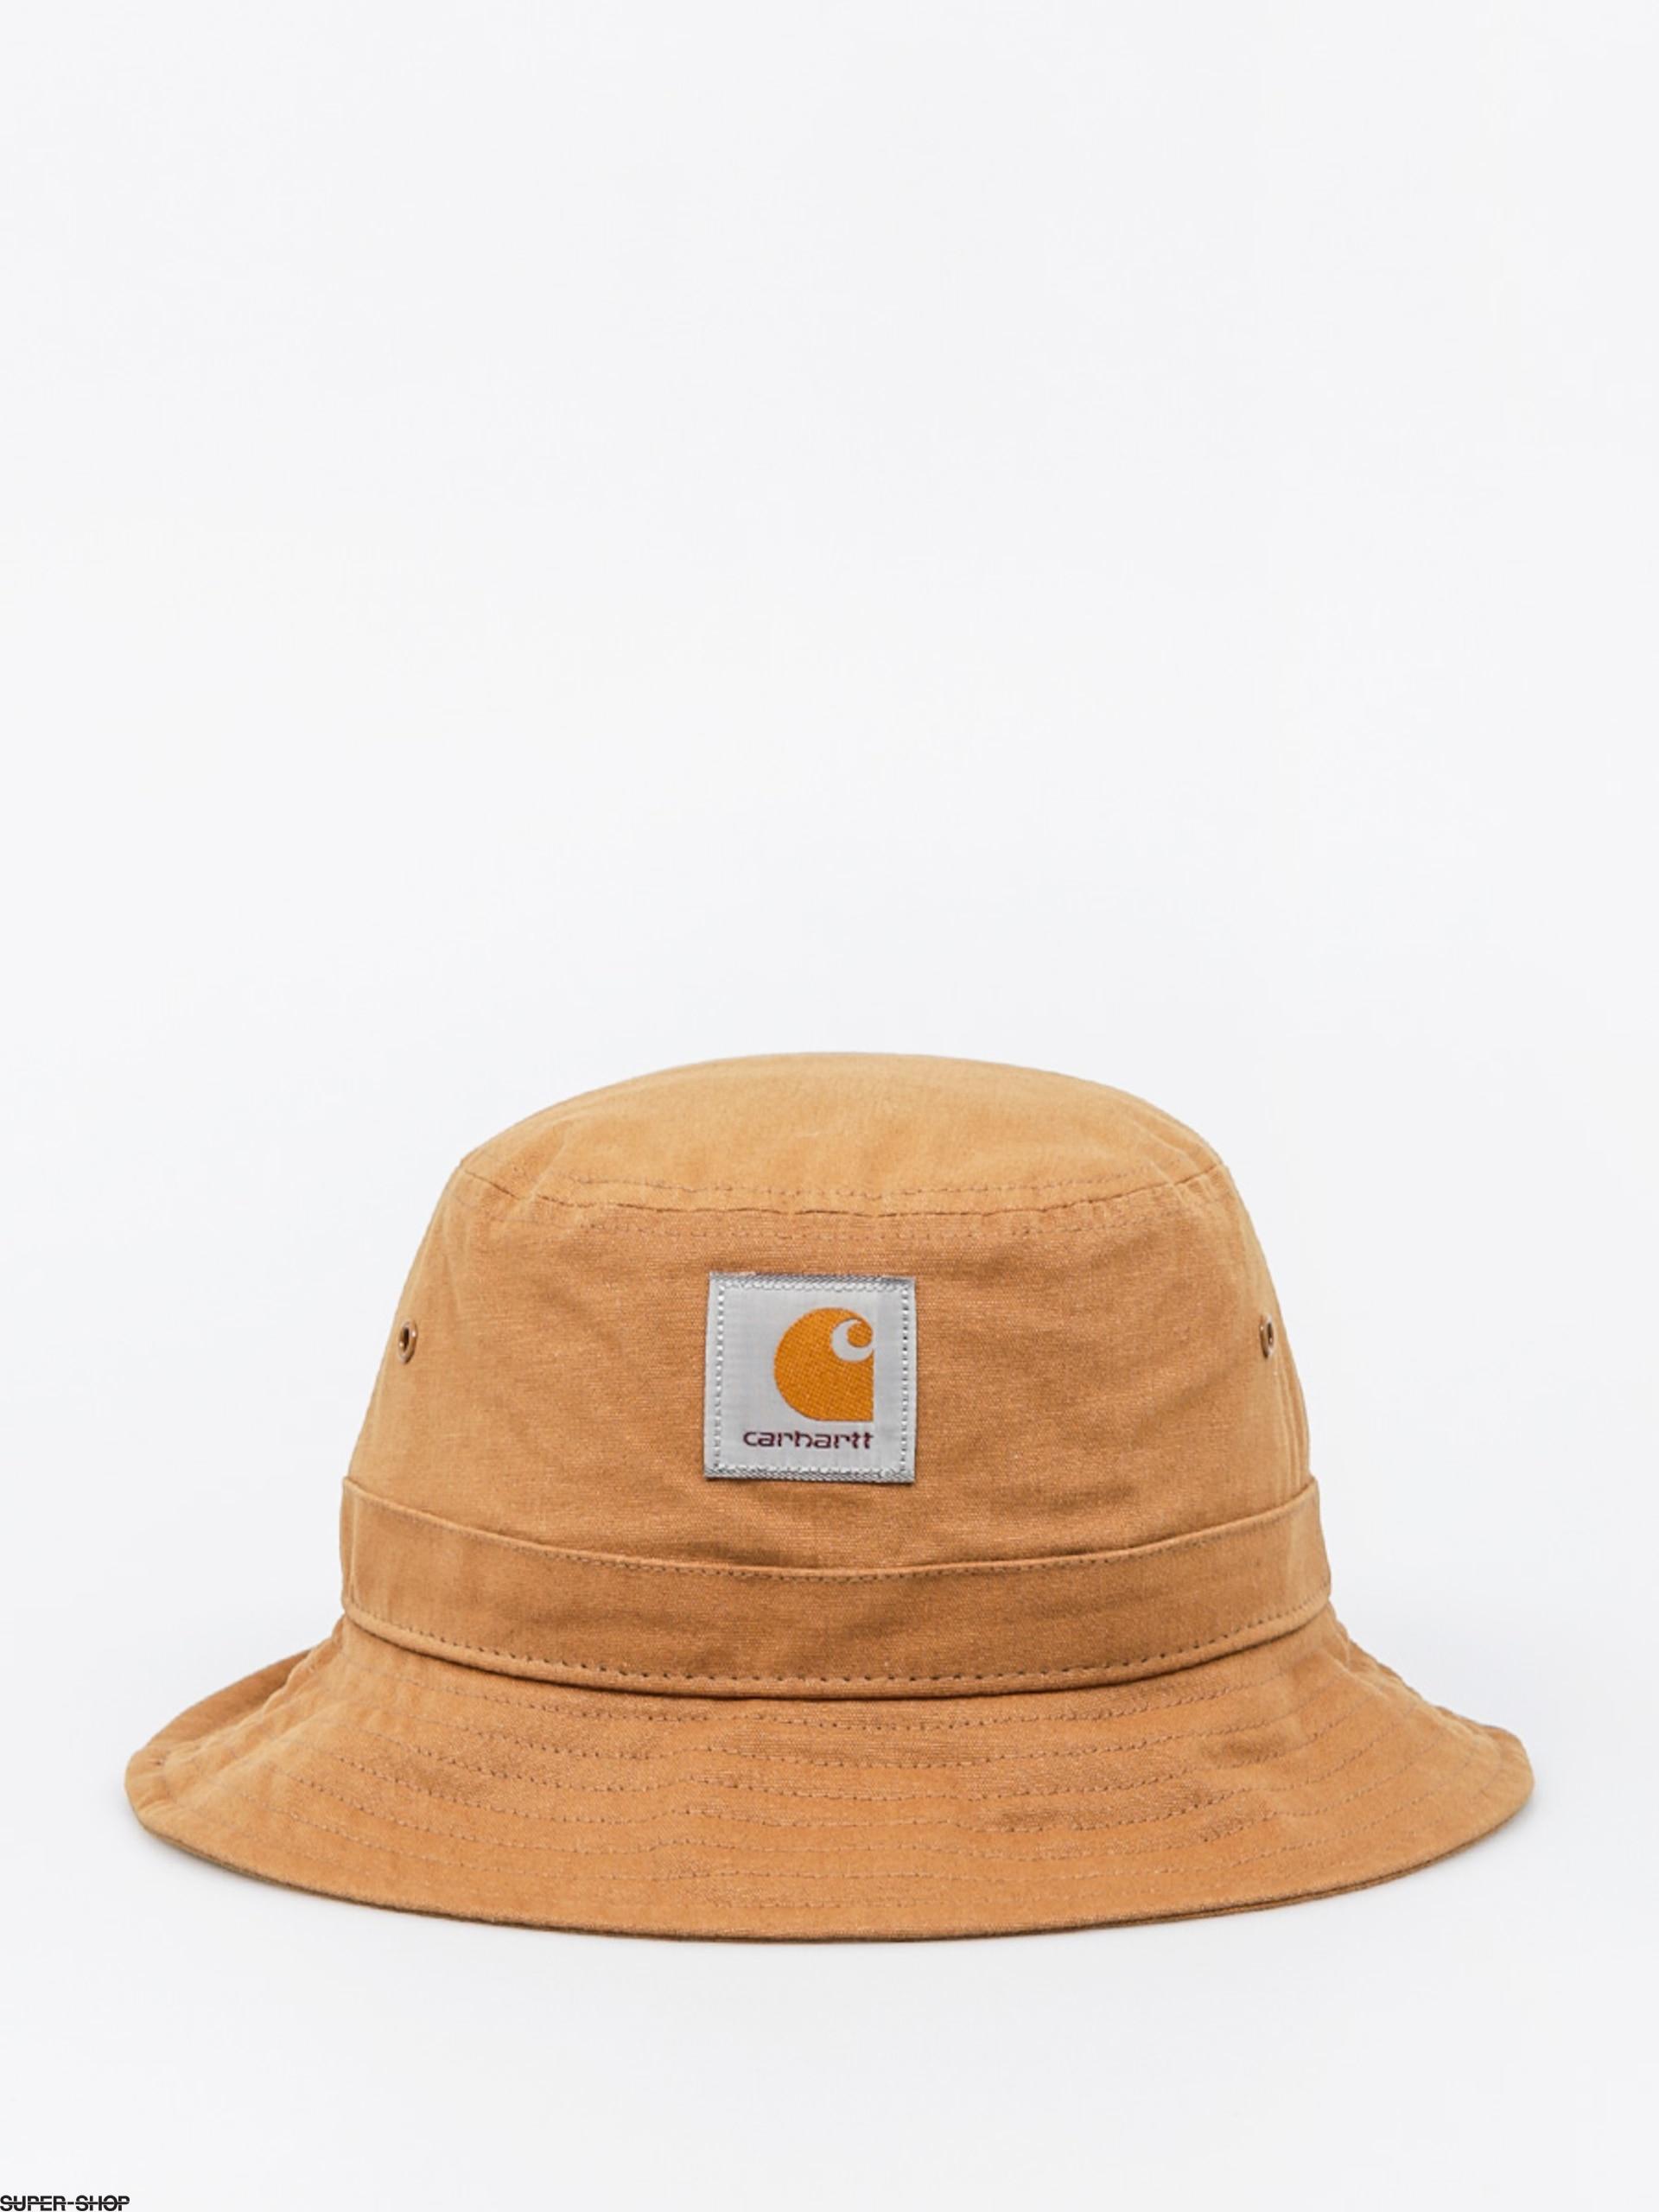 c06df4889268b 781265-w1920-carhartt-hat-watch-bucket-hamilton-brown.jpg